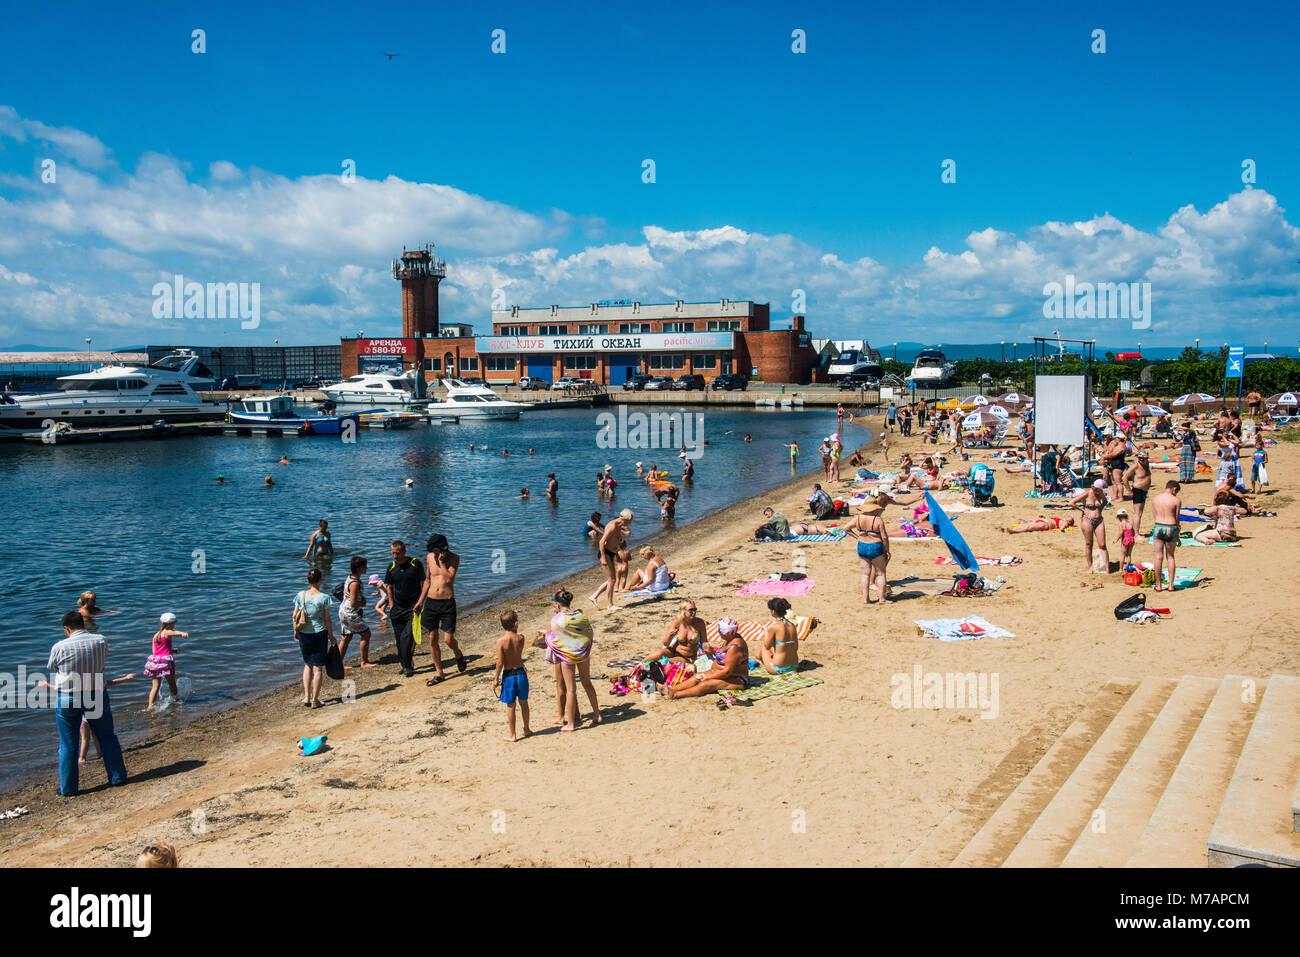 Sportivnaya Gavan boulevard, Vladivostok, Russia - Stock Image